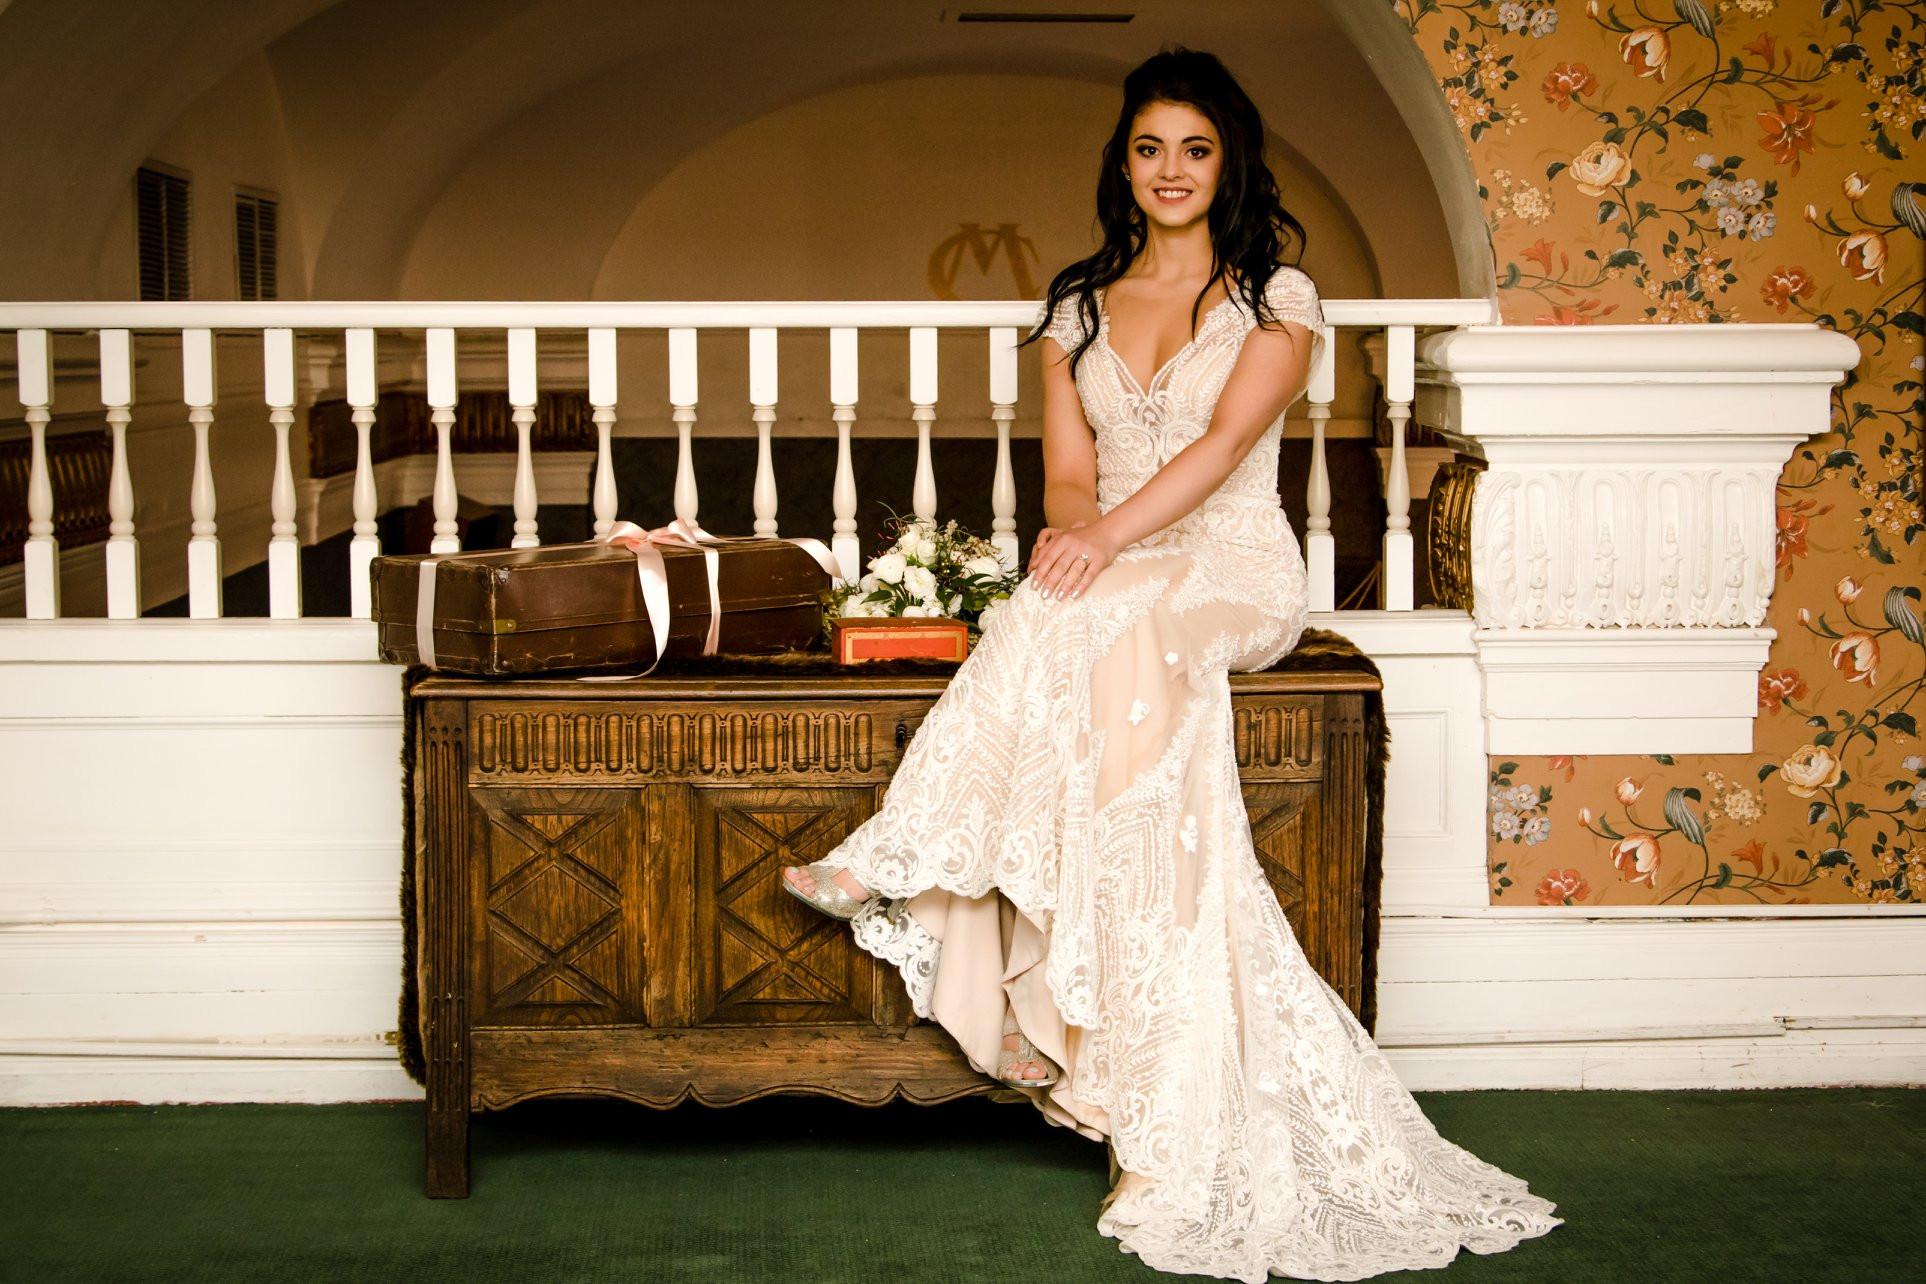 Bridal Trial Makeup & Beauty Consult